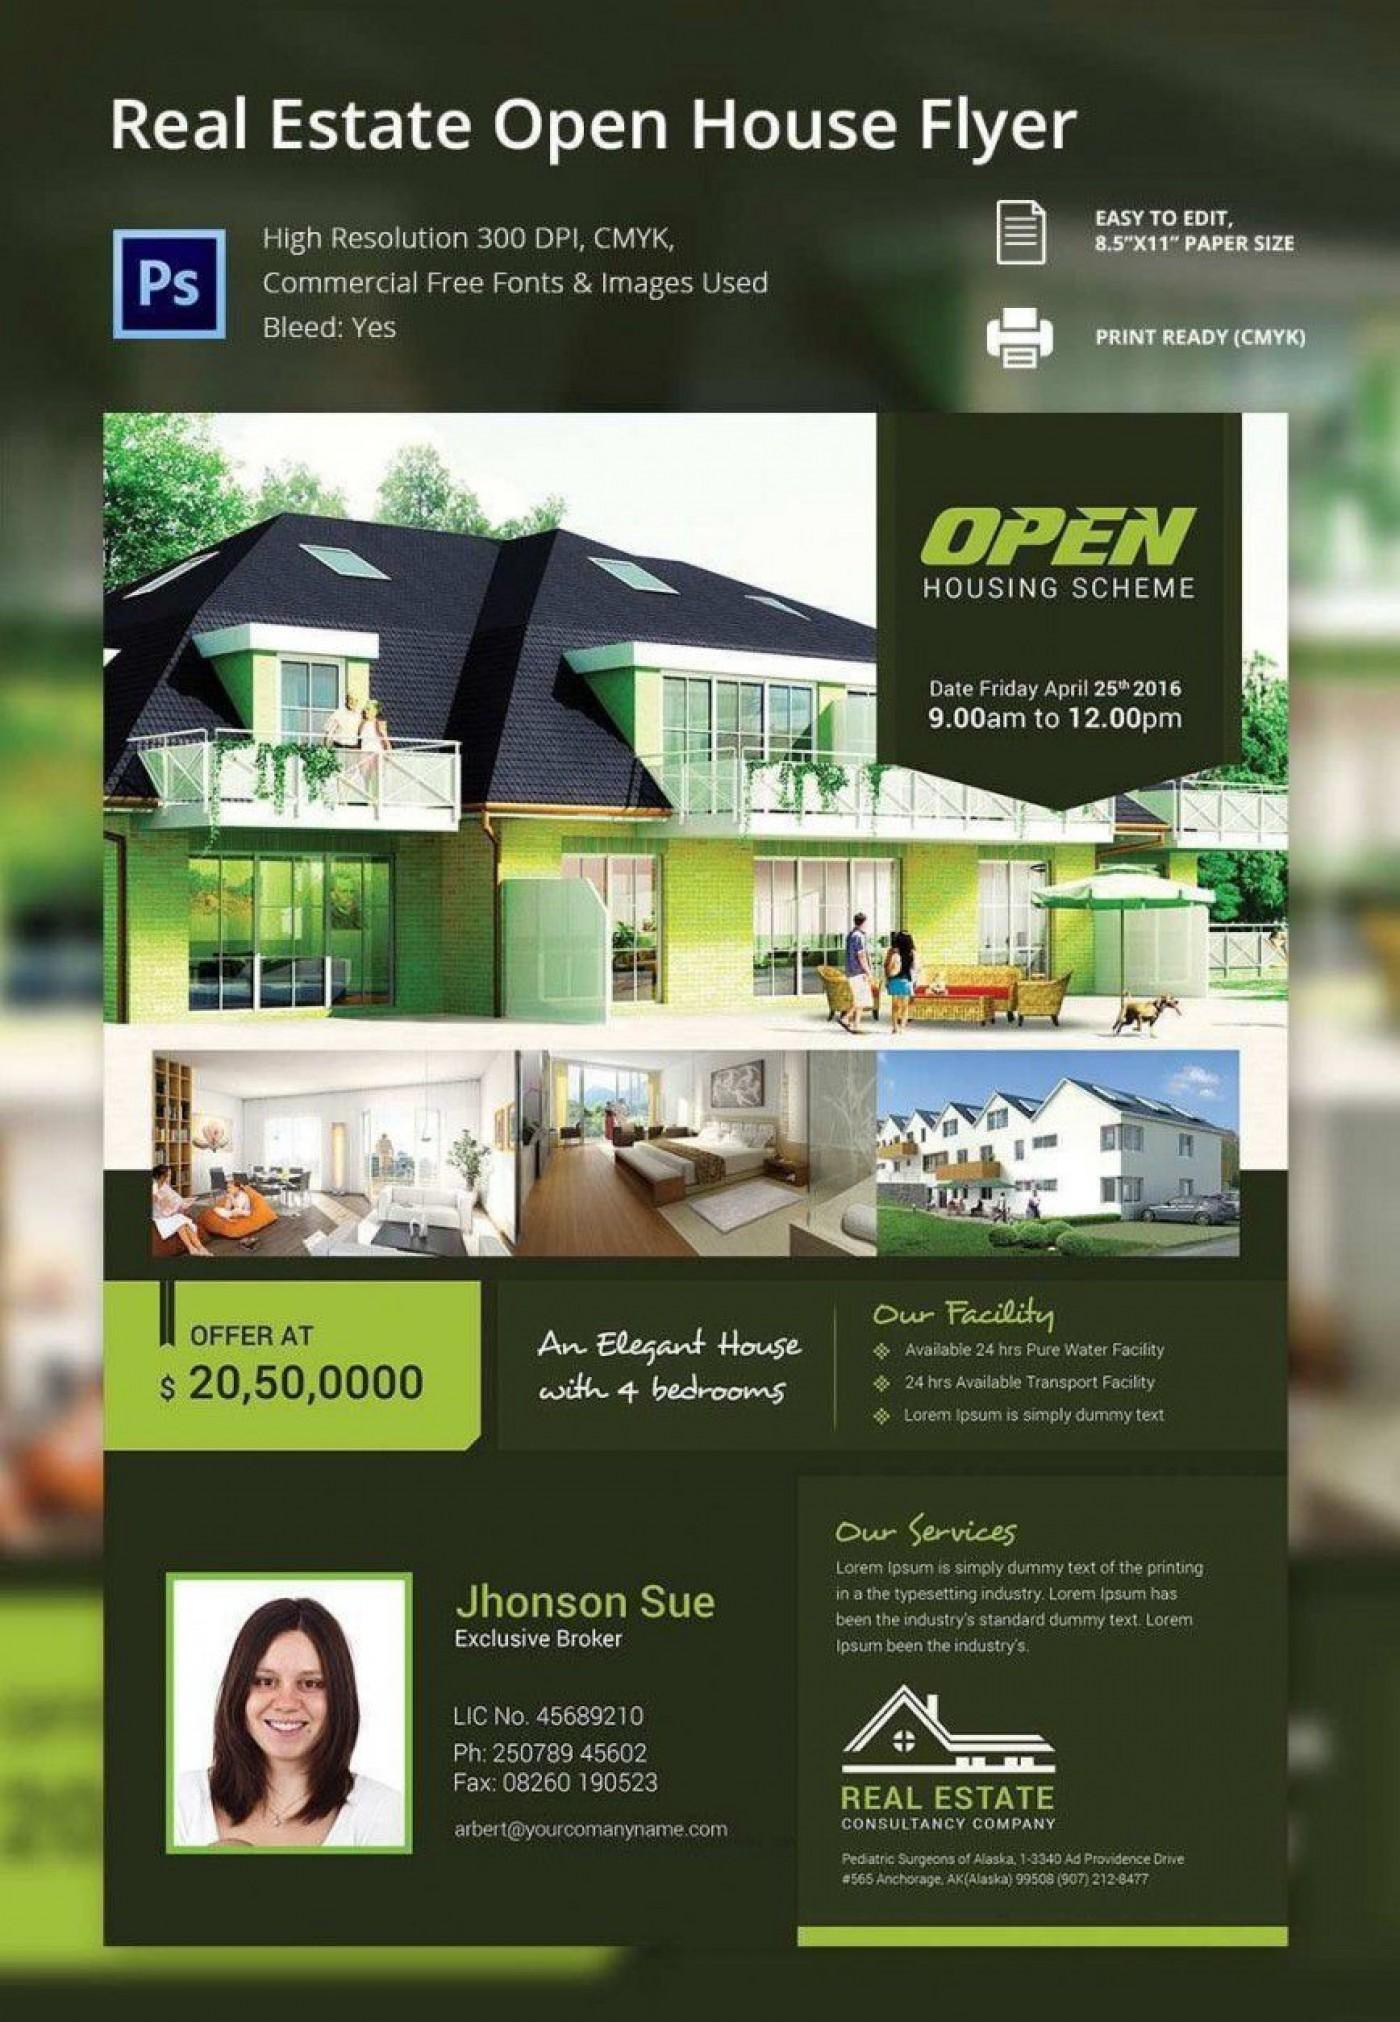 000 Beautiful Open House Flyer Template High Def  Word Free School Microsoft1400